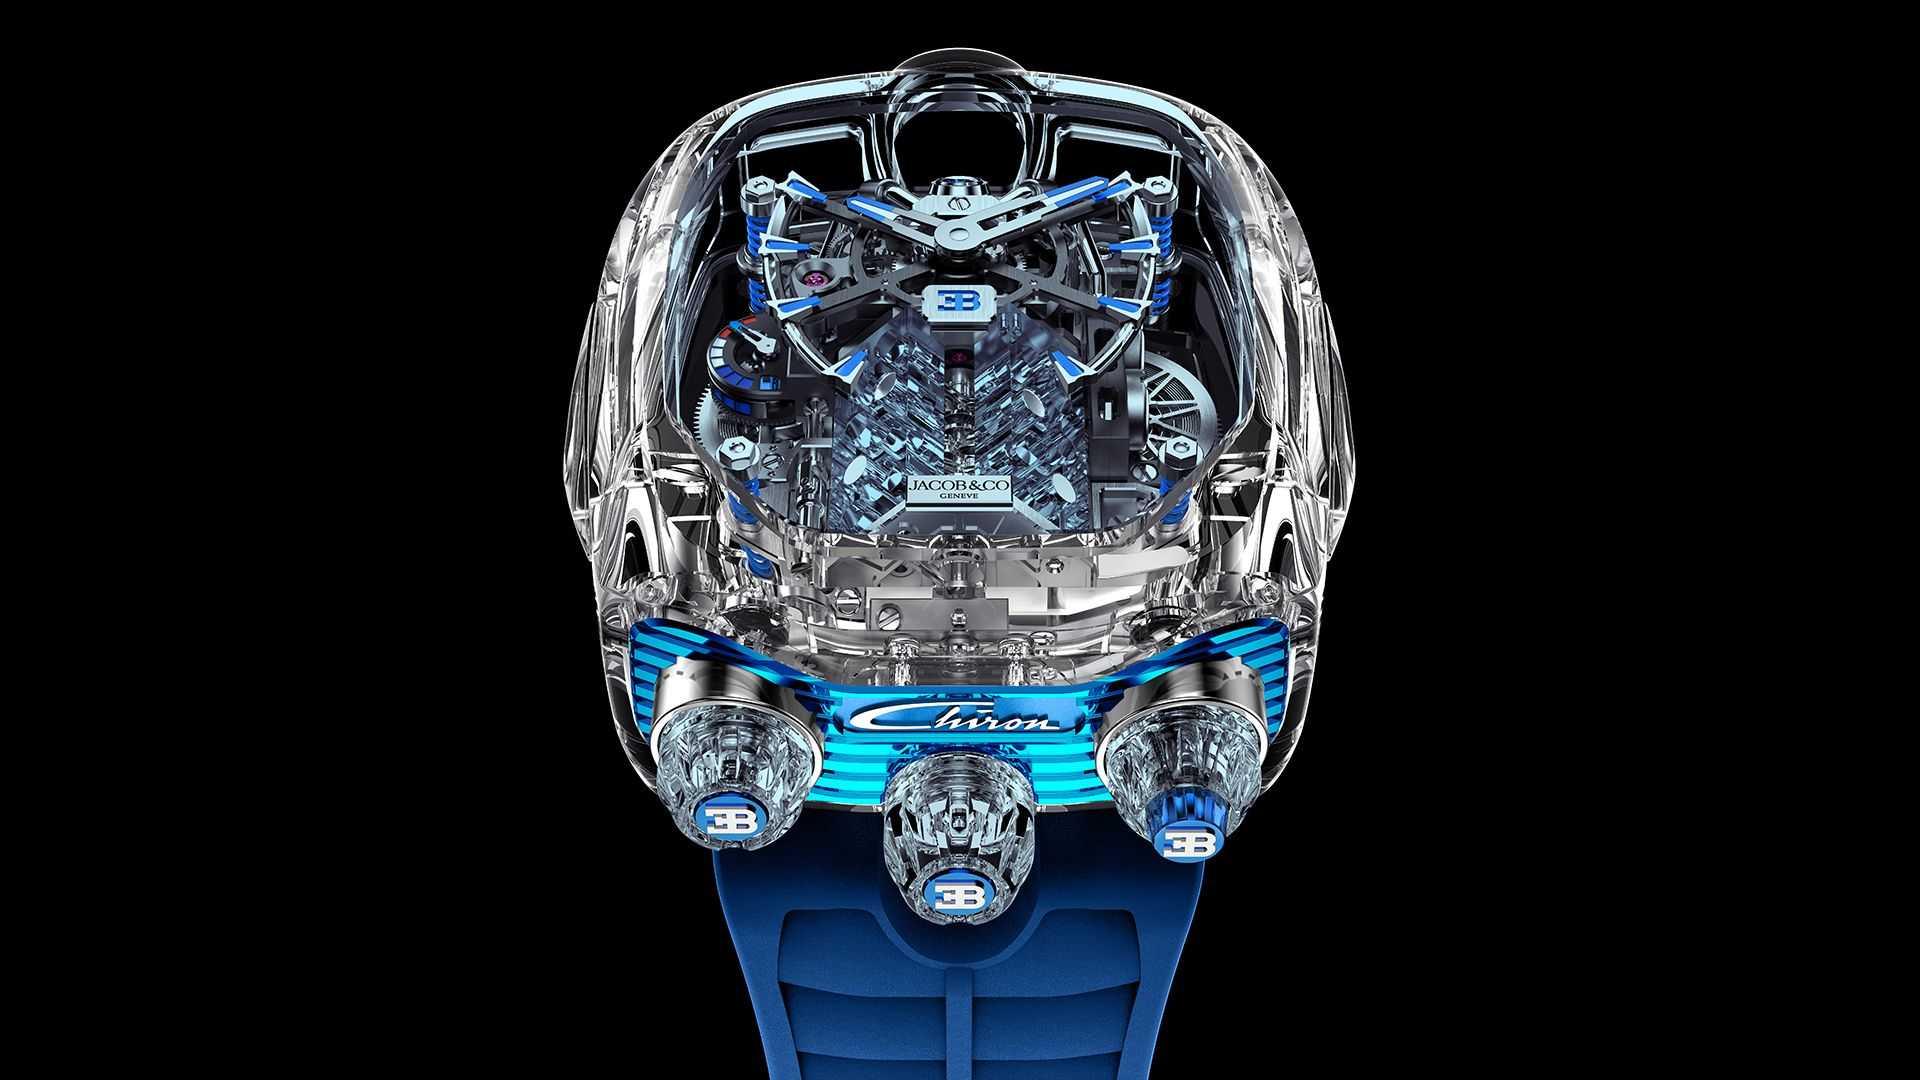 Jacob-Co-Bugatti-Chiron-Tourbillon-Watch-5